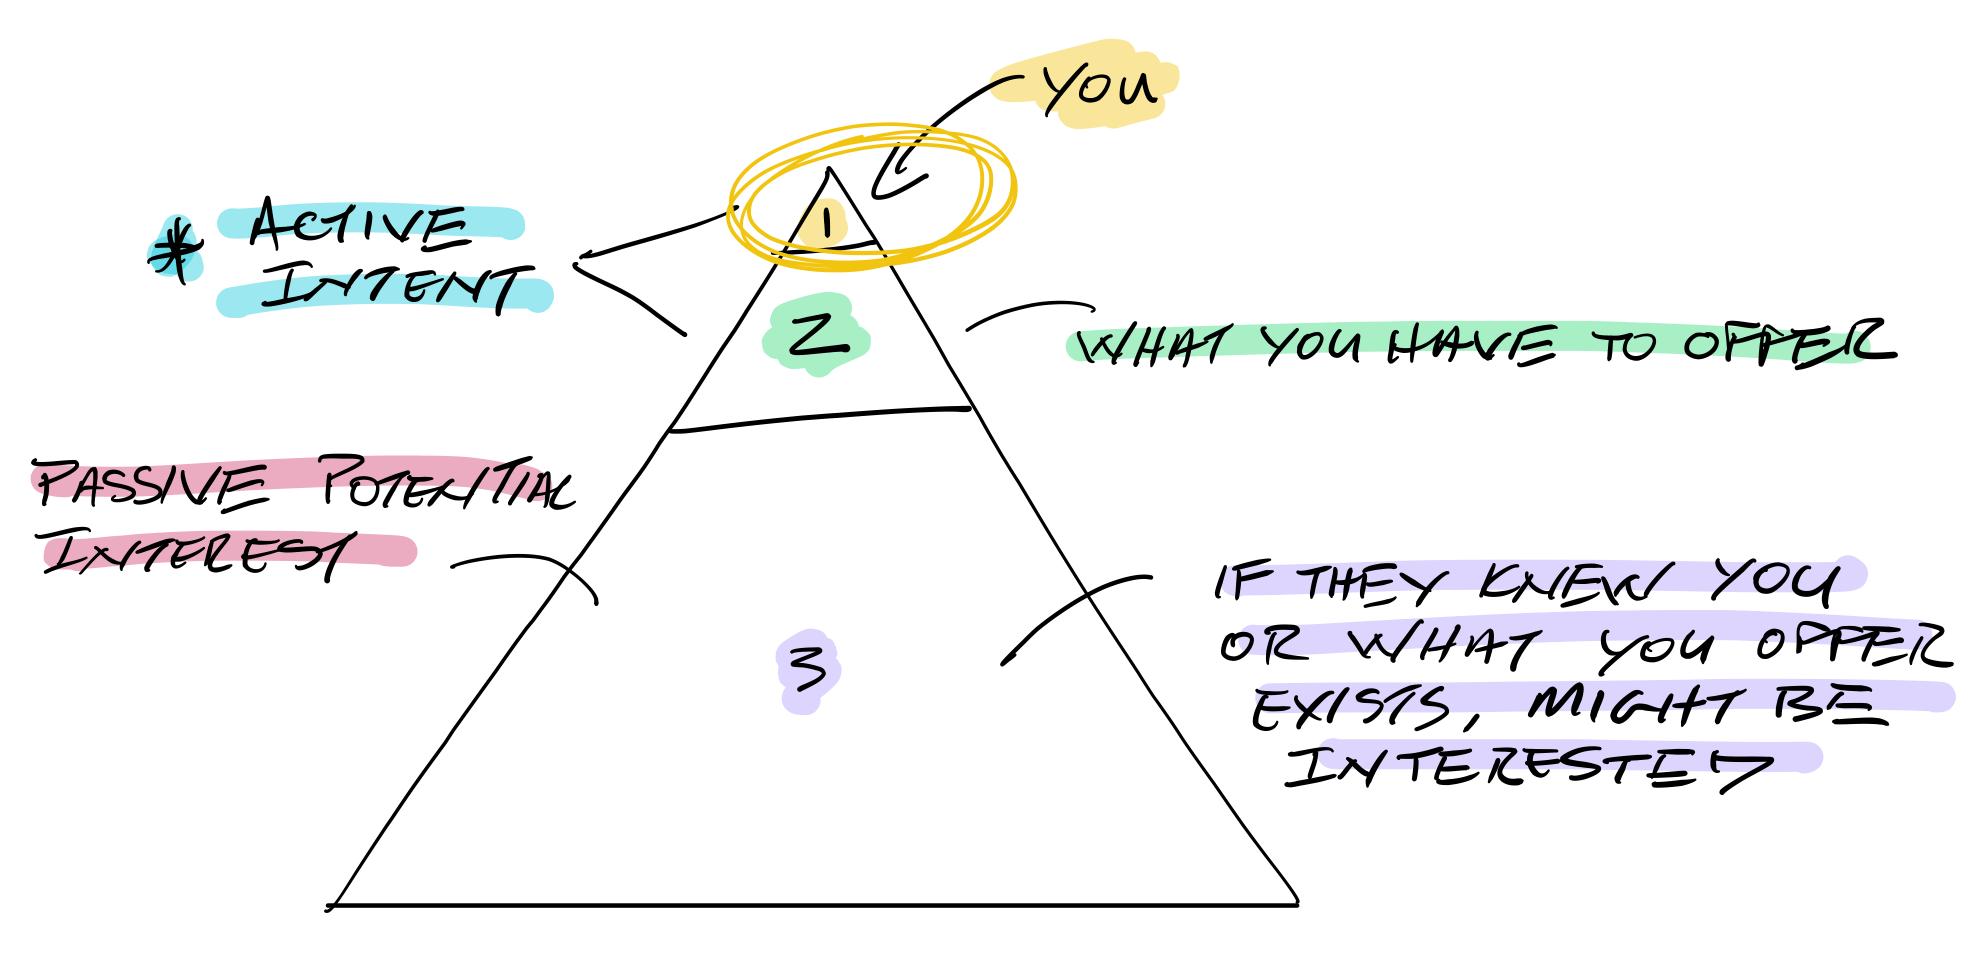 The Traffic Engine - Traffic Pyramid